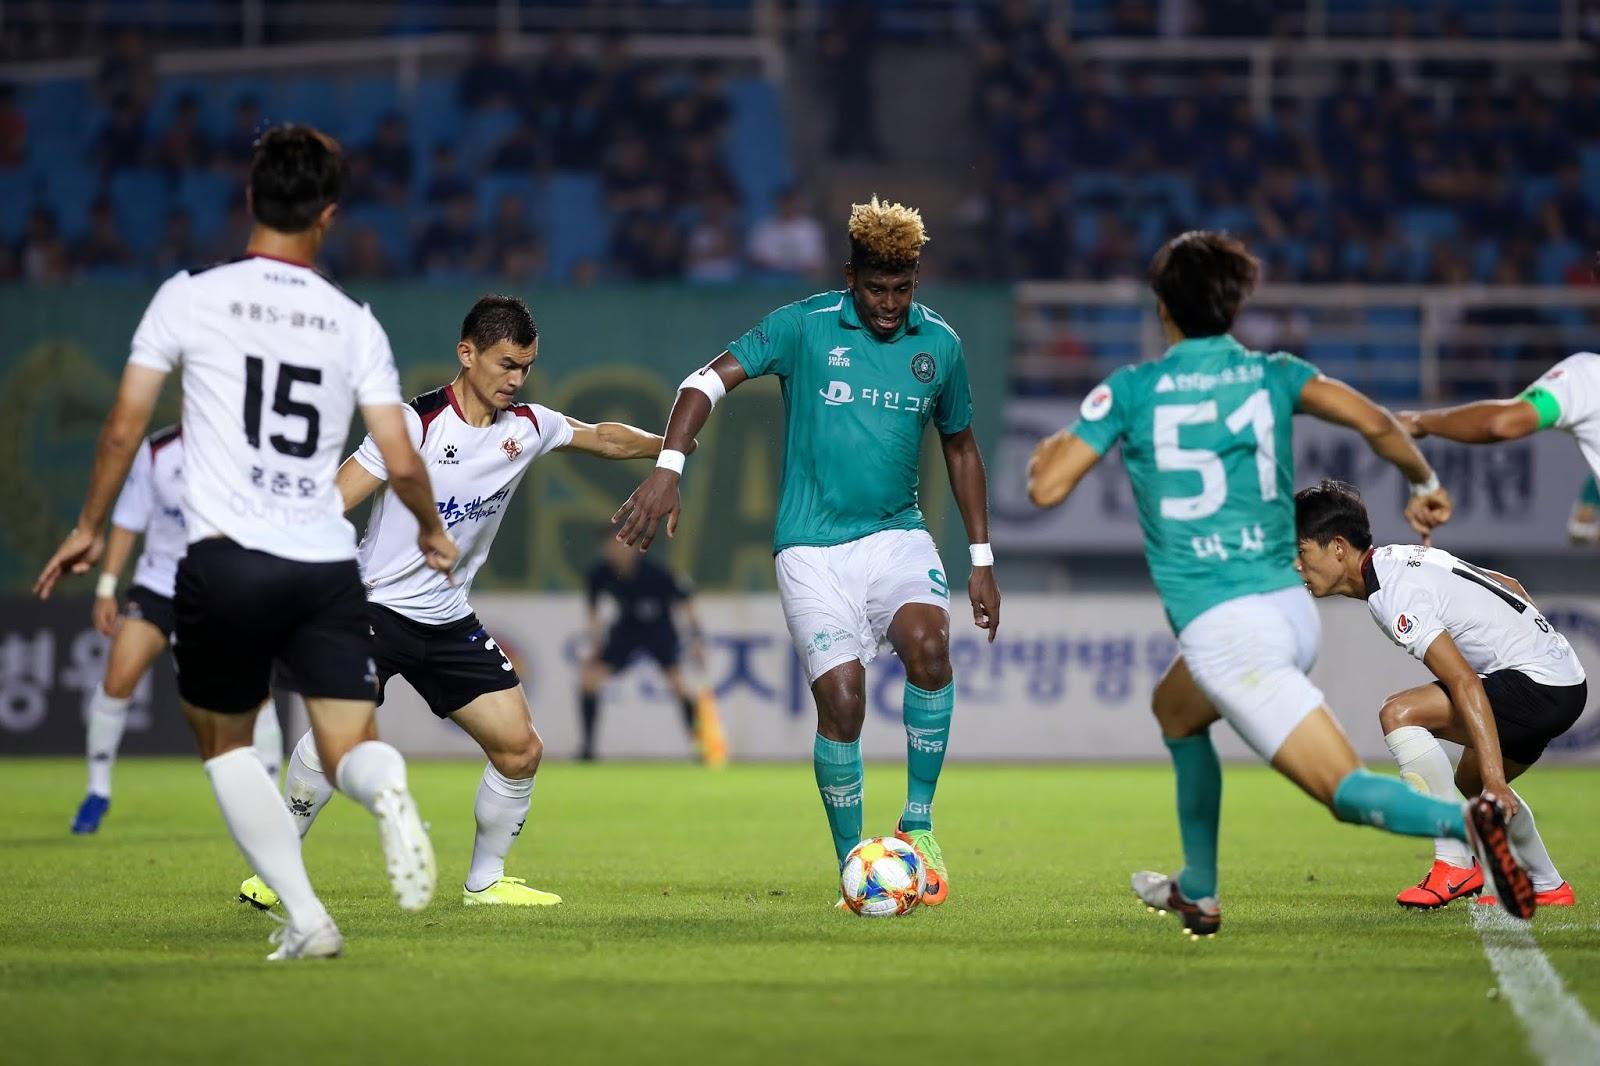 Gustavo Vintecinco vs Gwangju FC 09.01